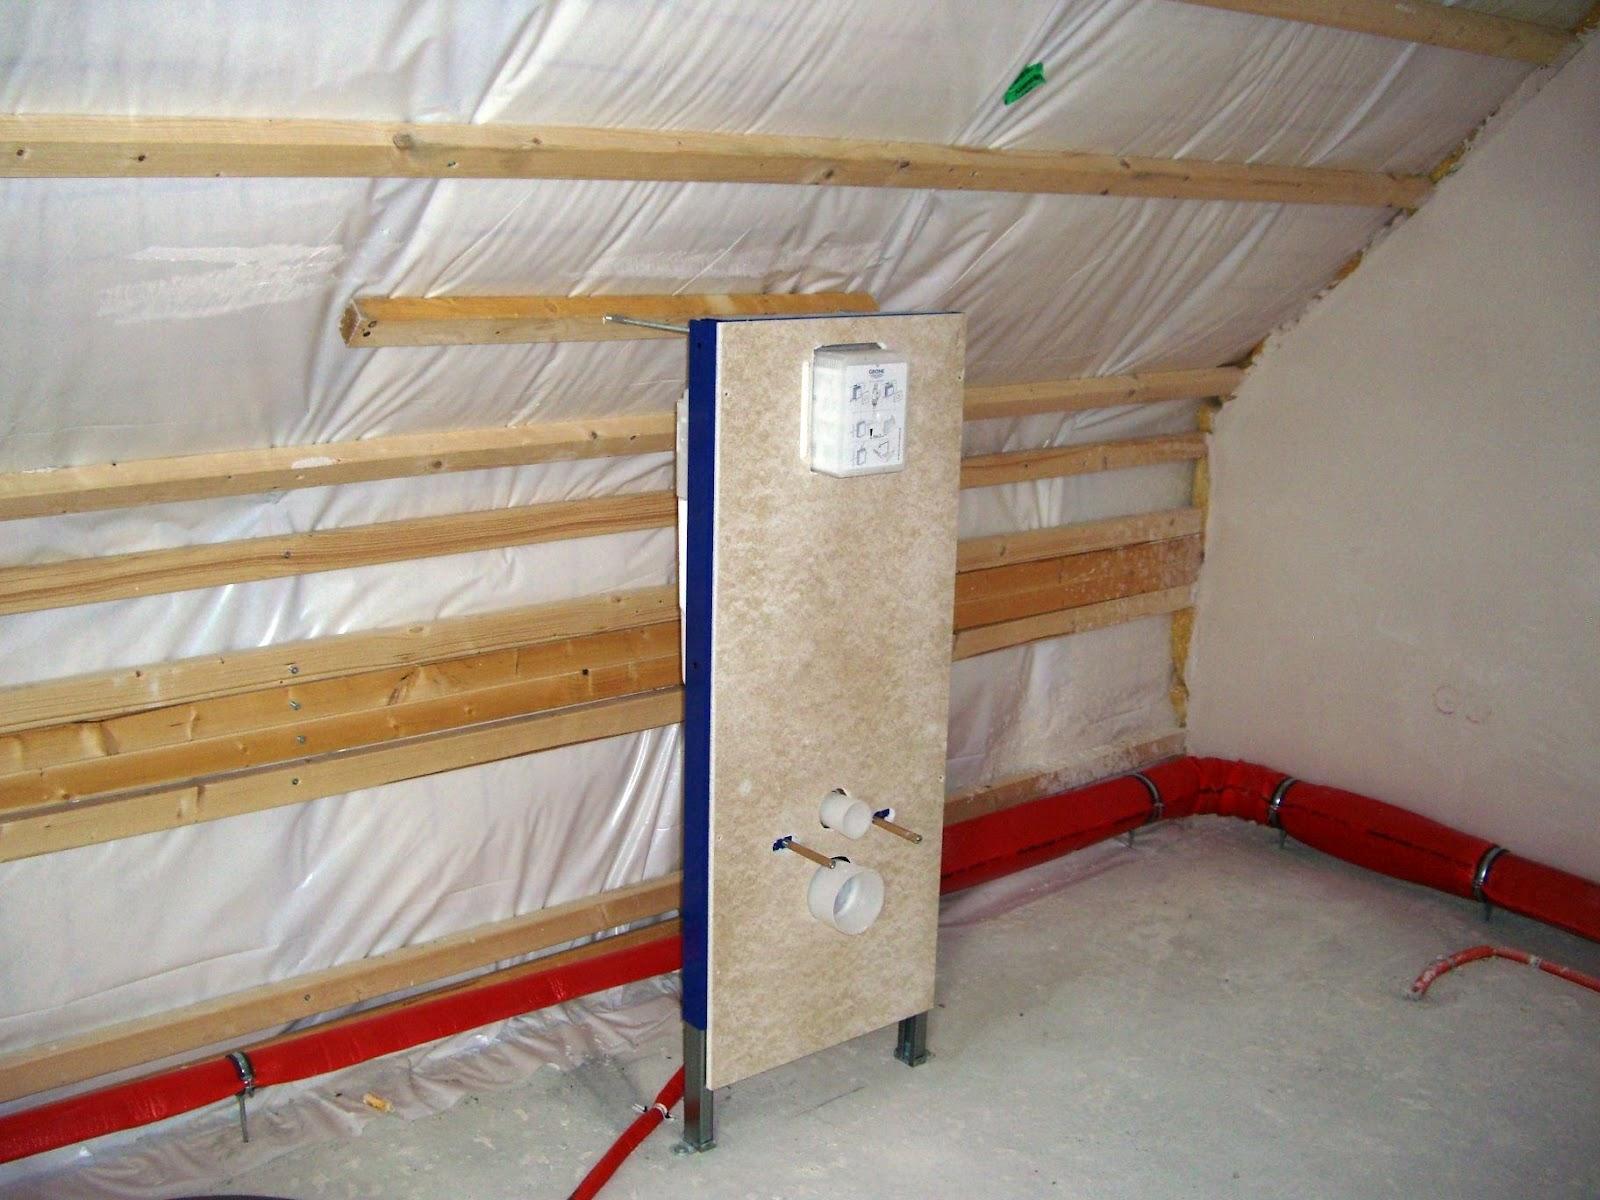 hausbau ak ds die sanit rrohinstallation ist fertig. Black Bedroom Furniture Sets. Home Design Ideas